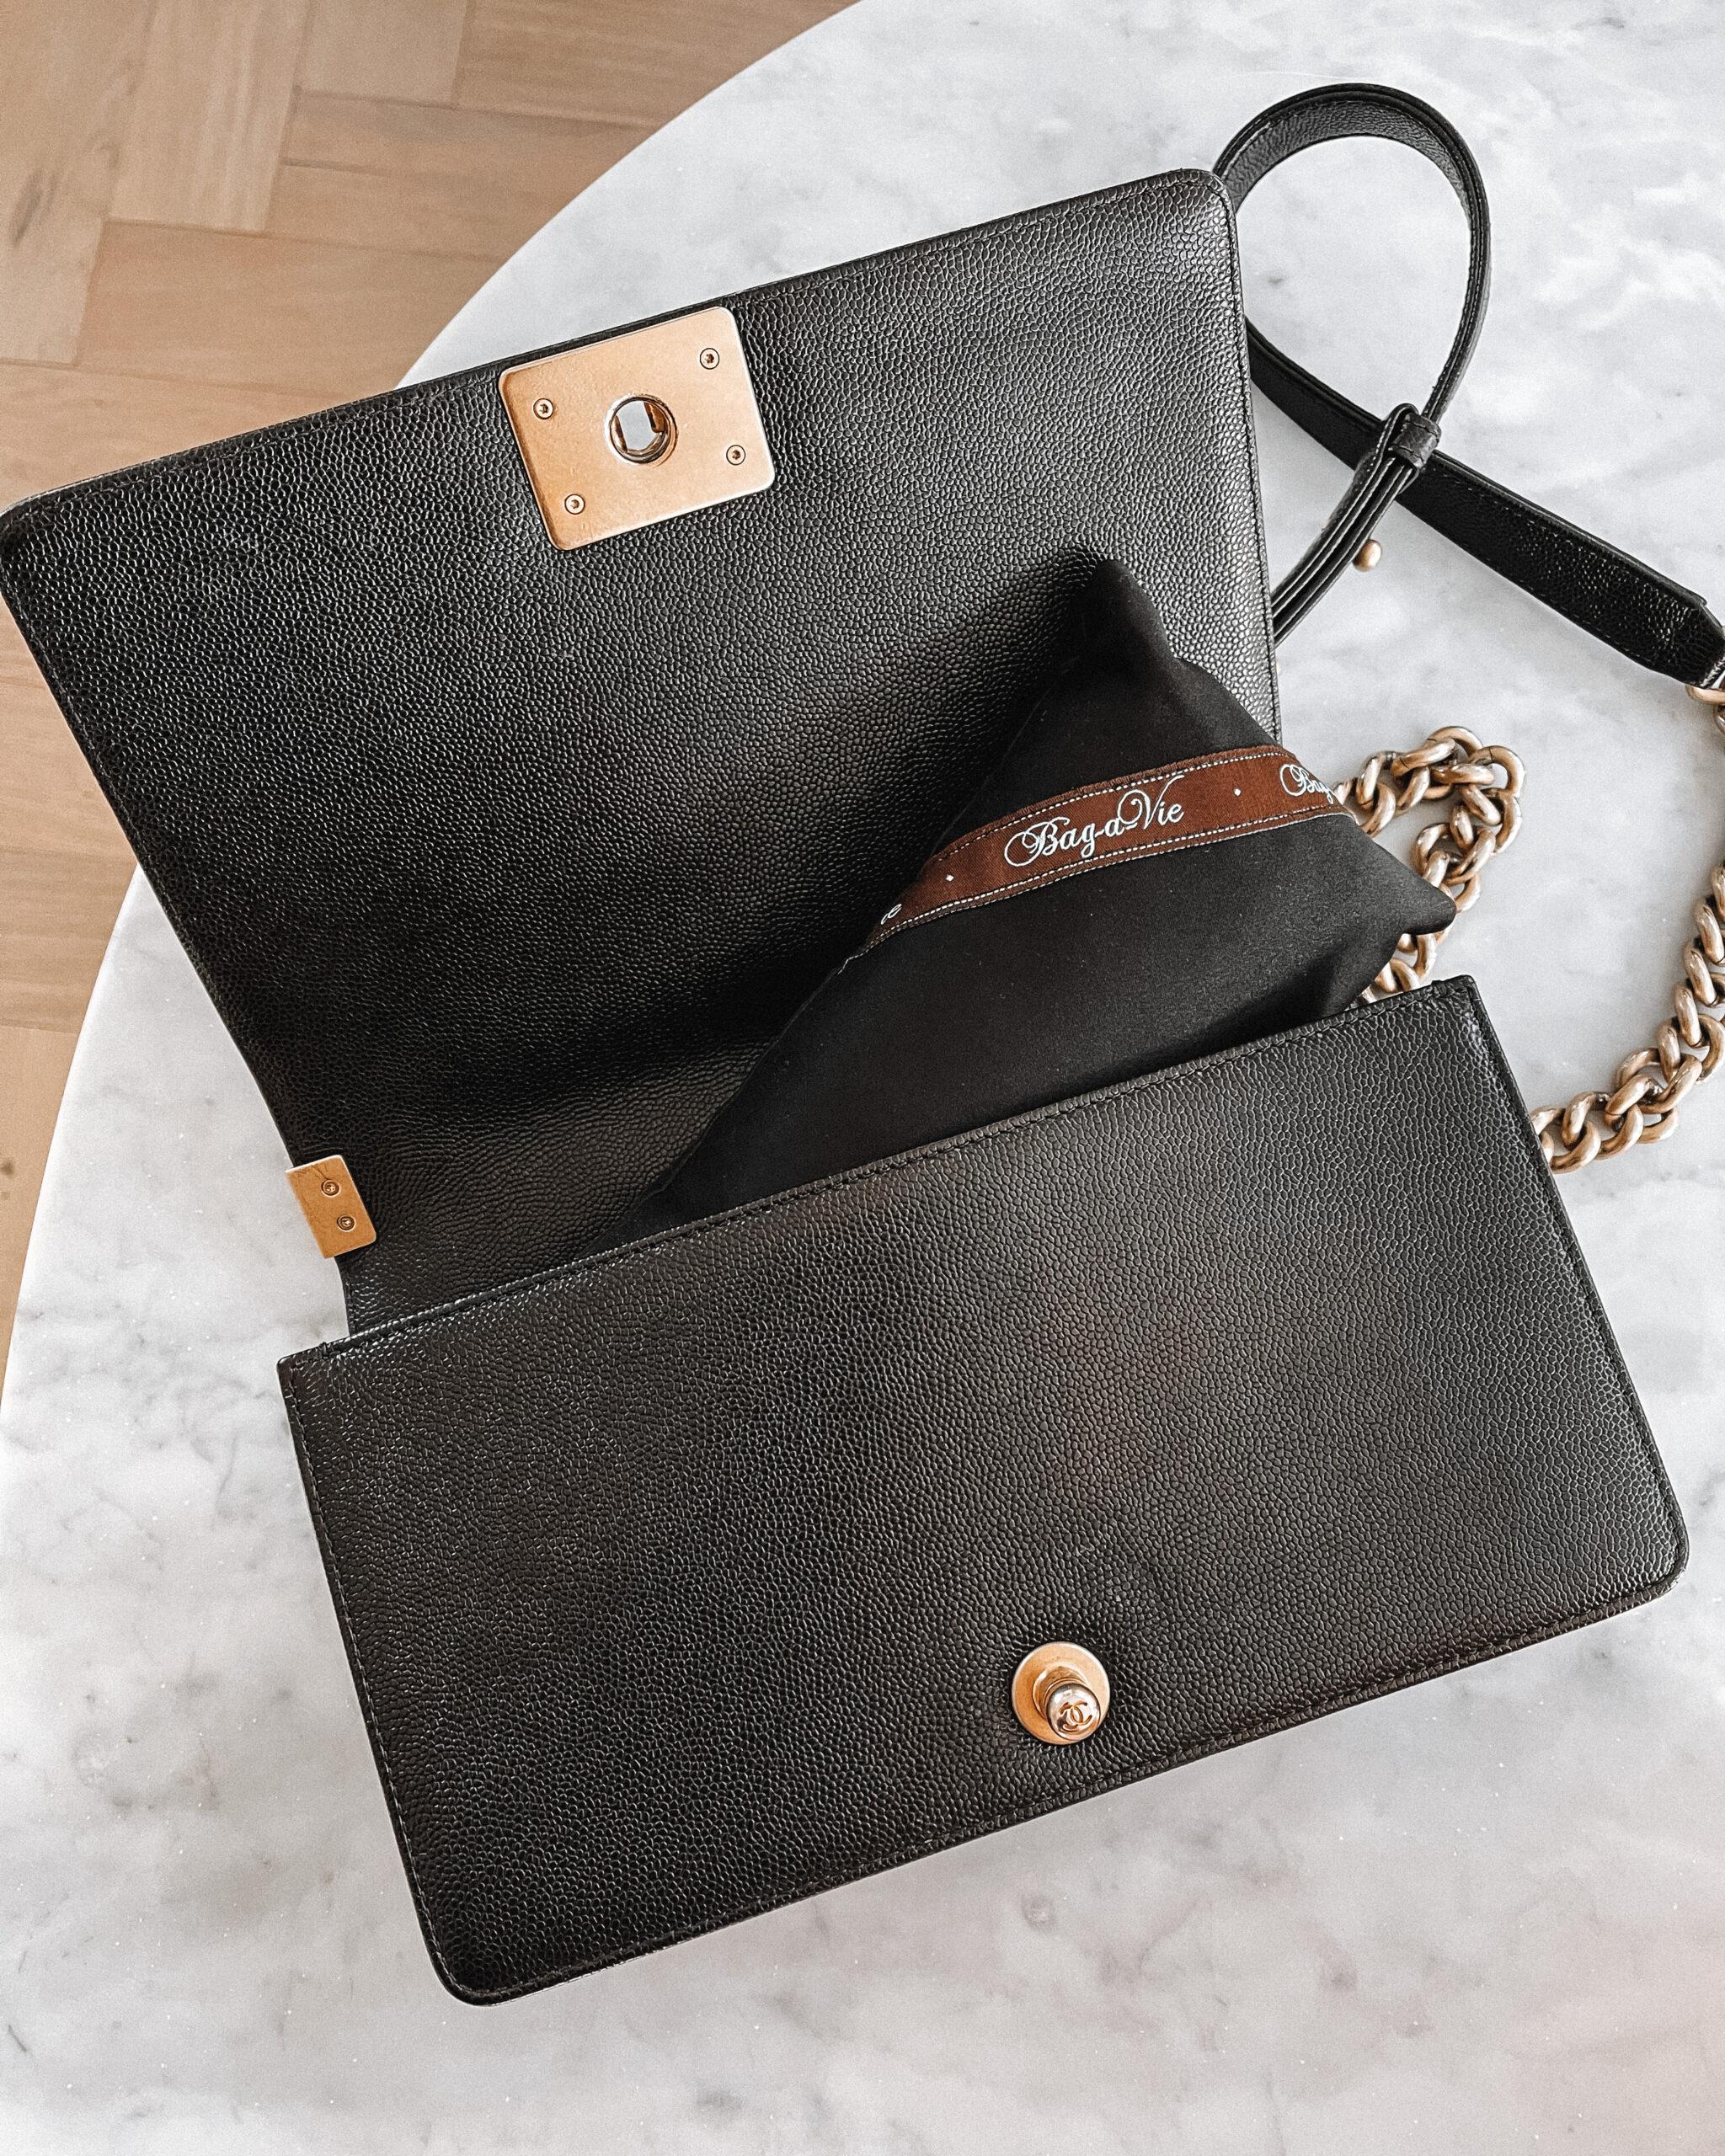 Fashion Jackson Amazon Fashion Handbag Pillow Insert